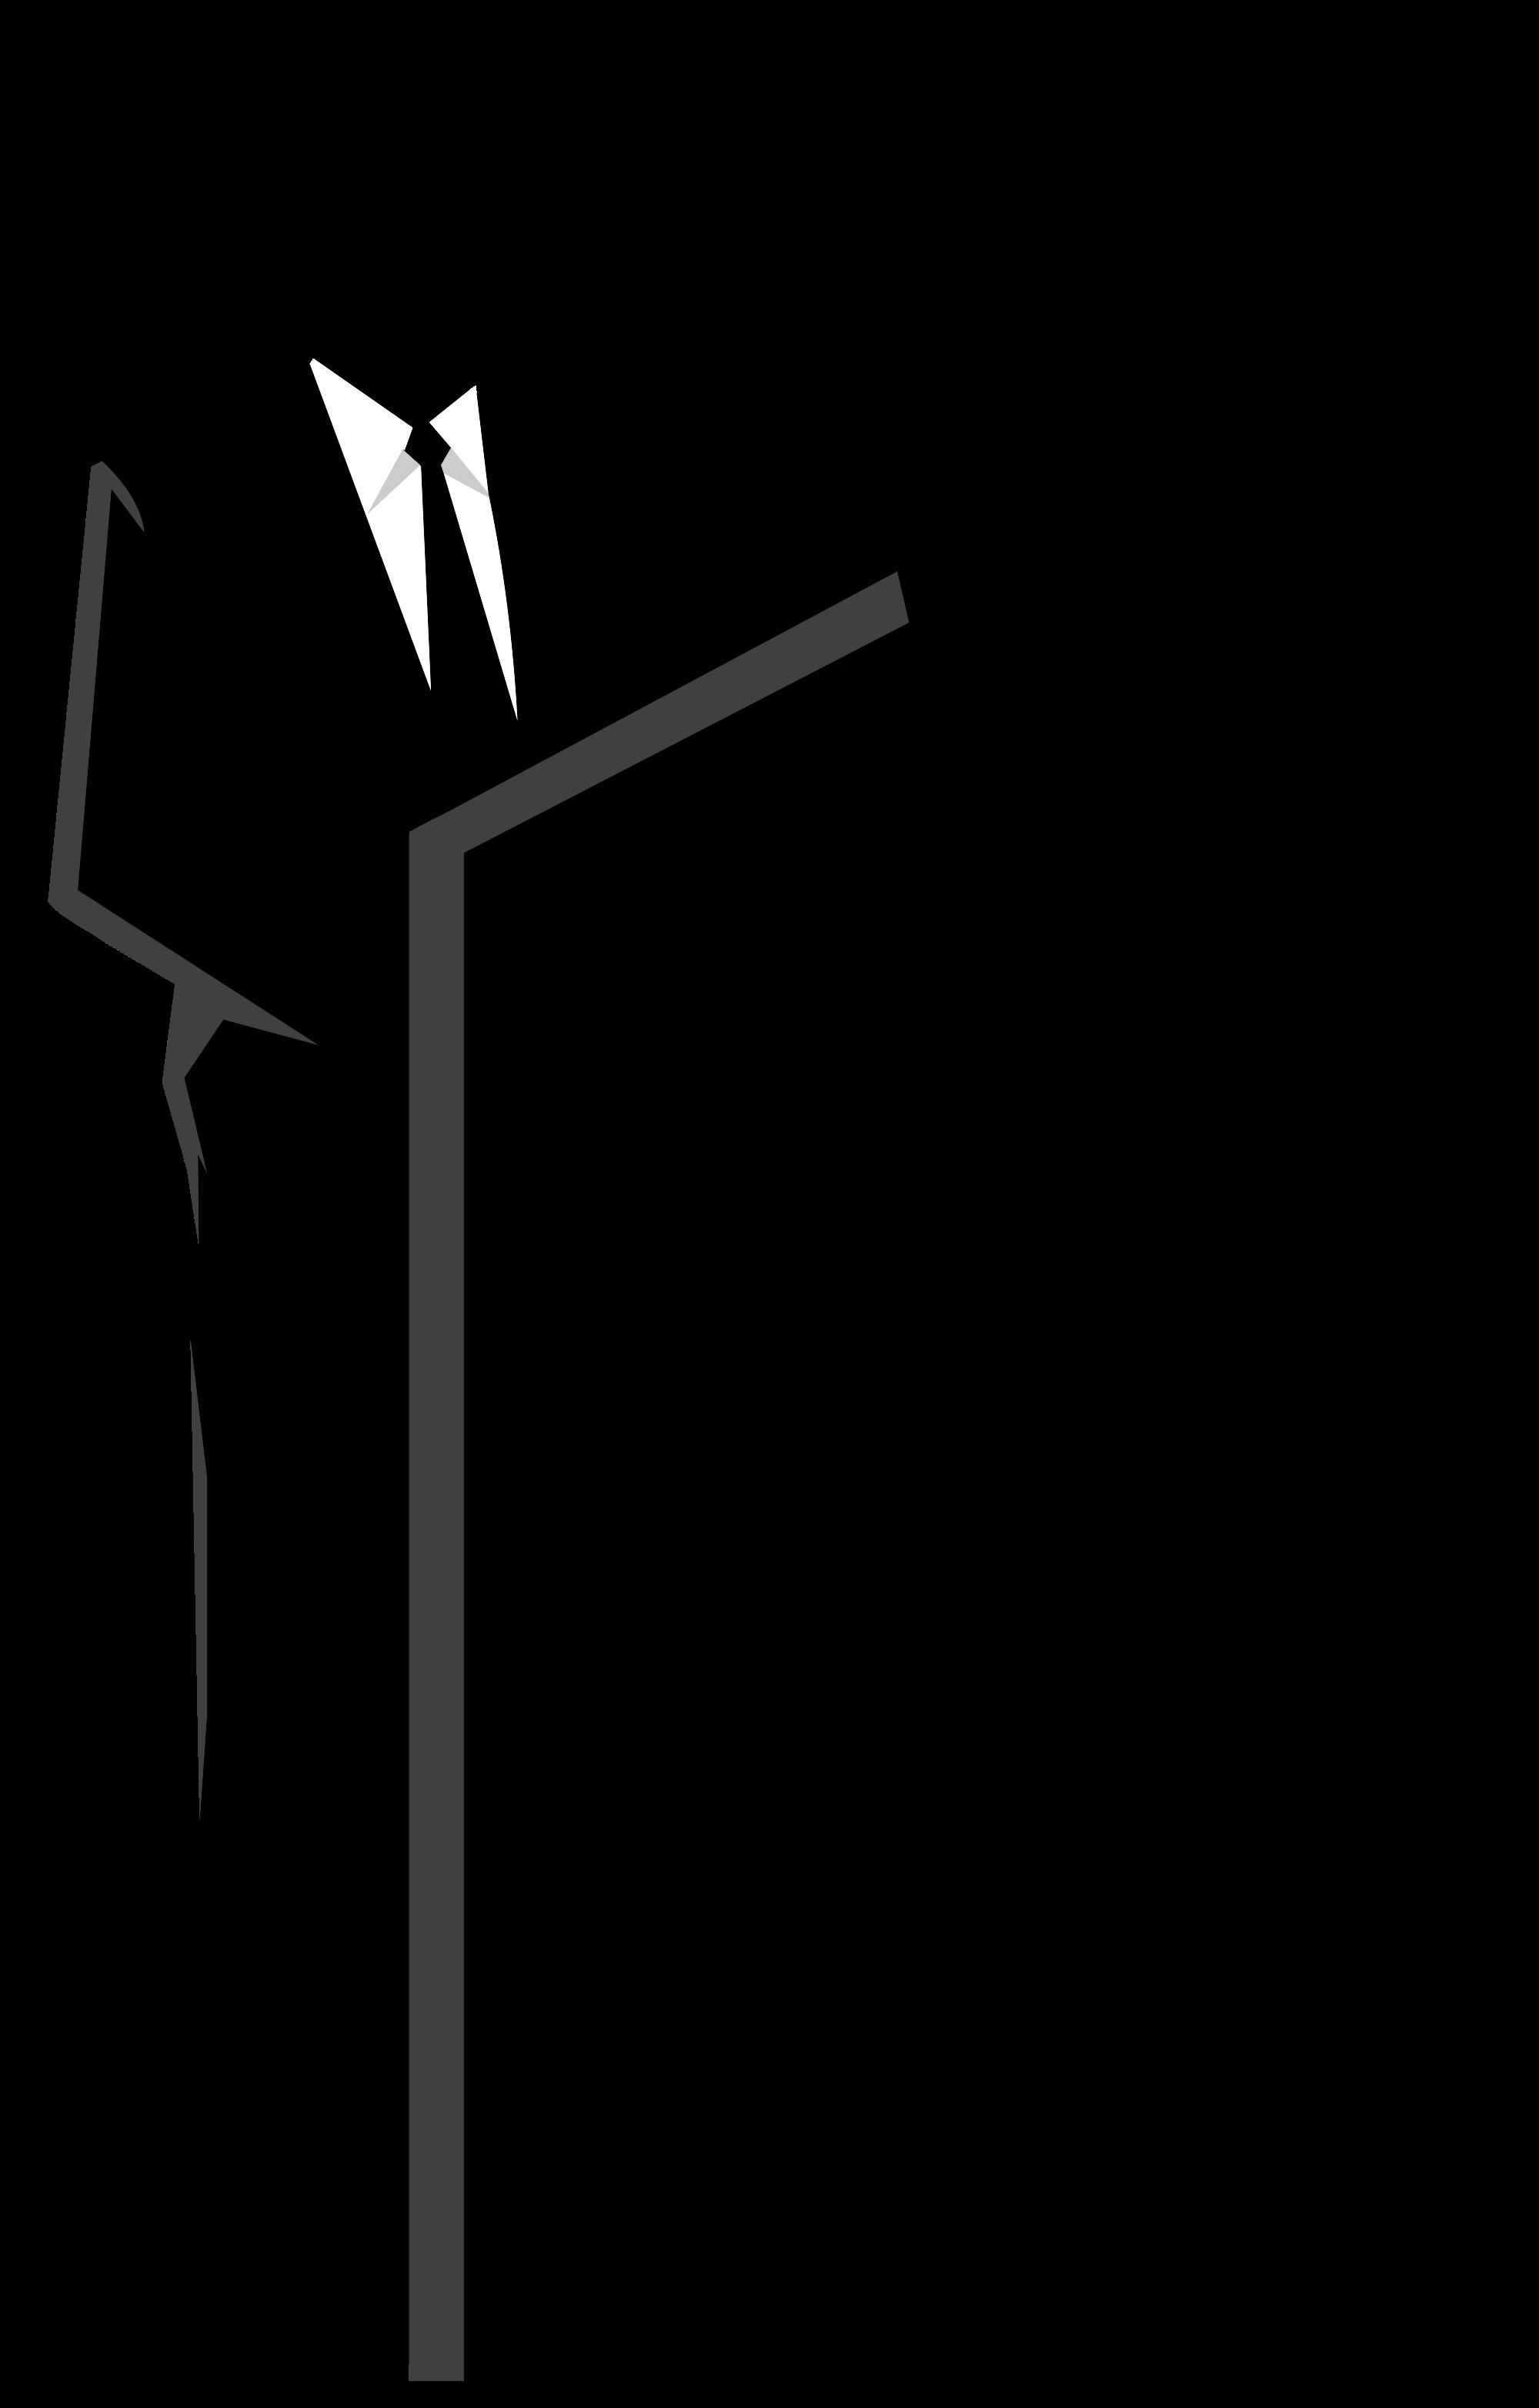 speech giving lori s lane Person Talking Clip Art open mouth talking clip art